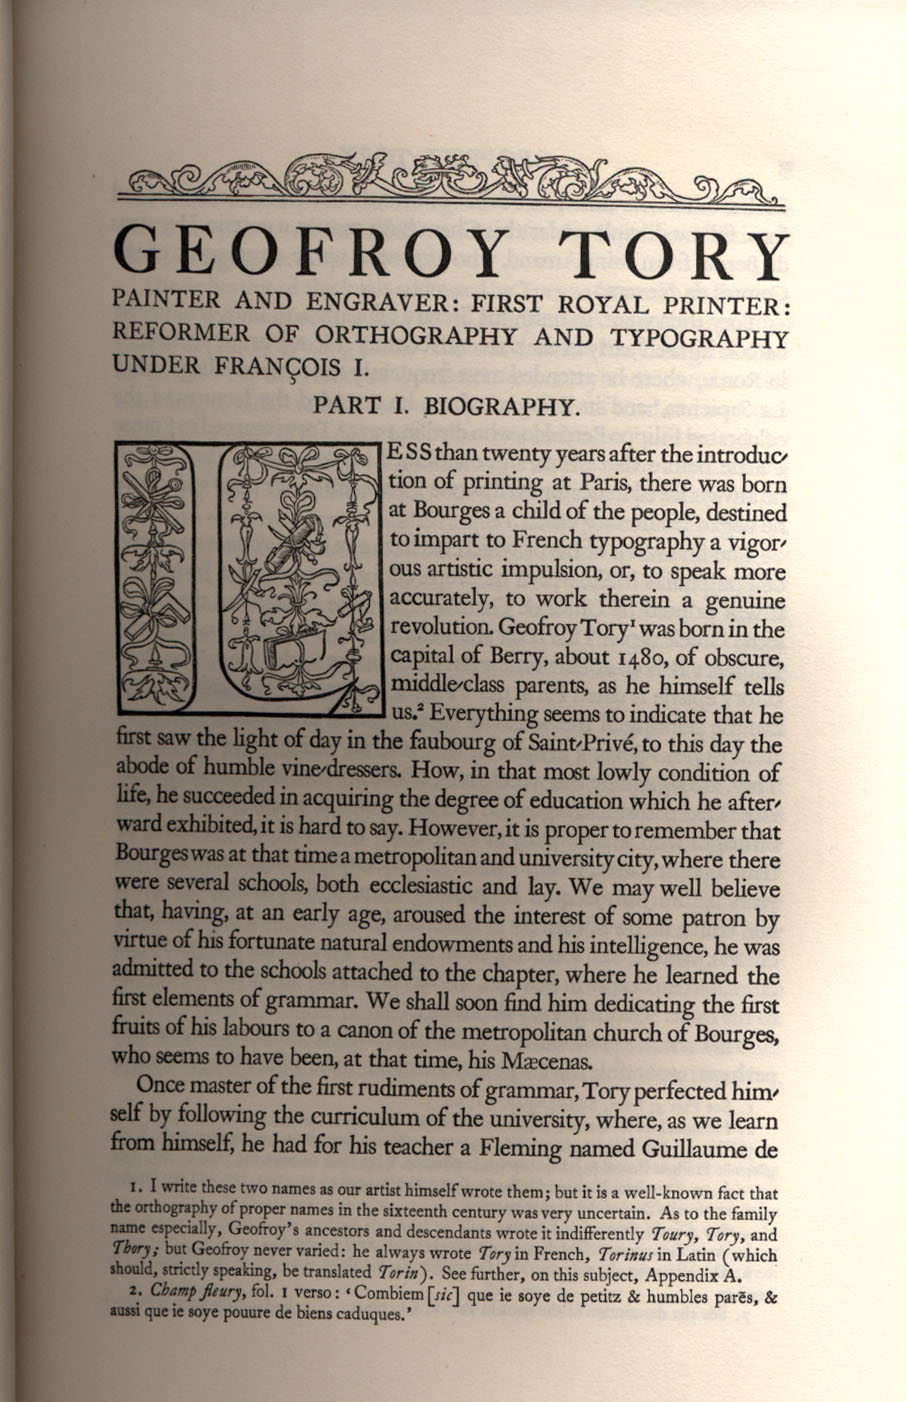 Geofroy Tory